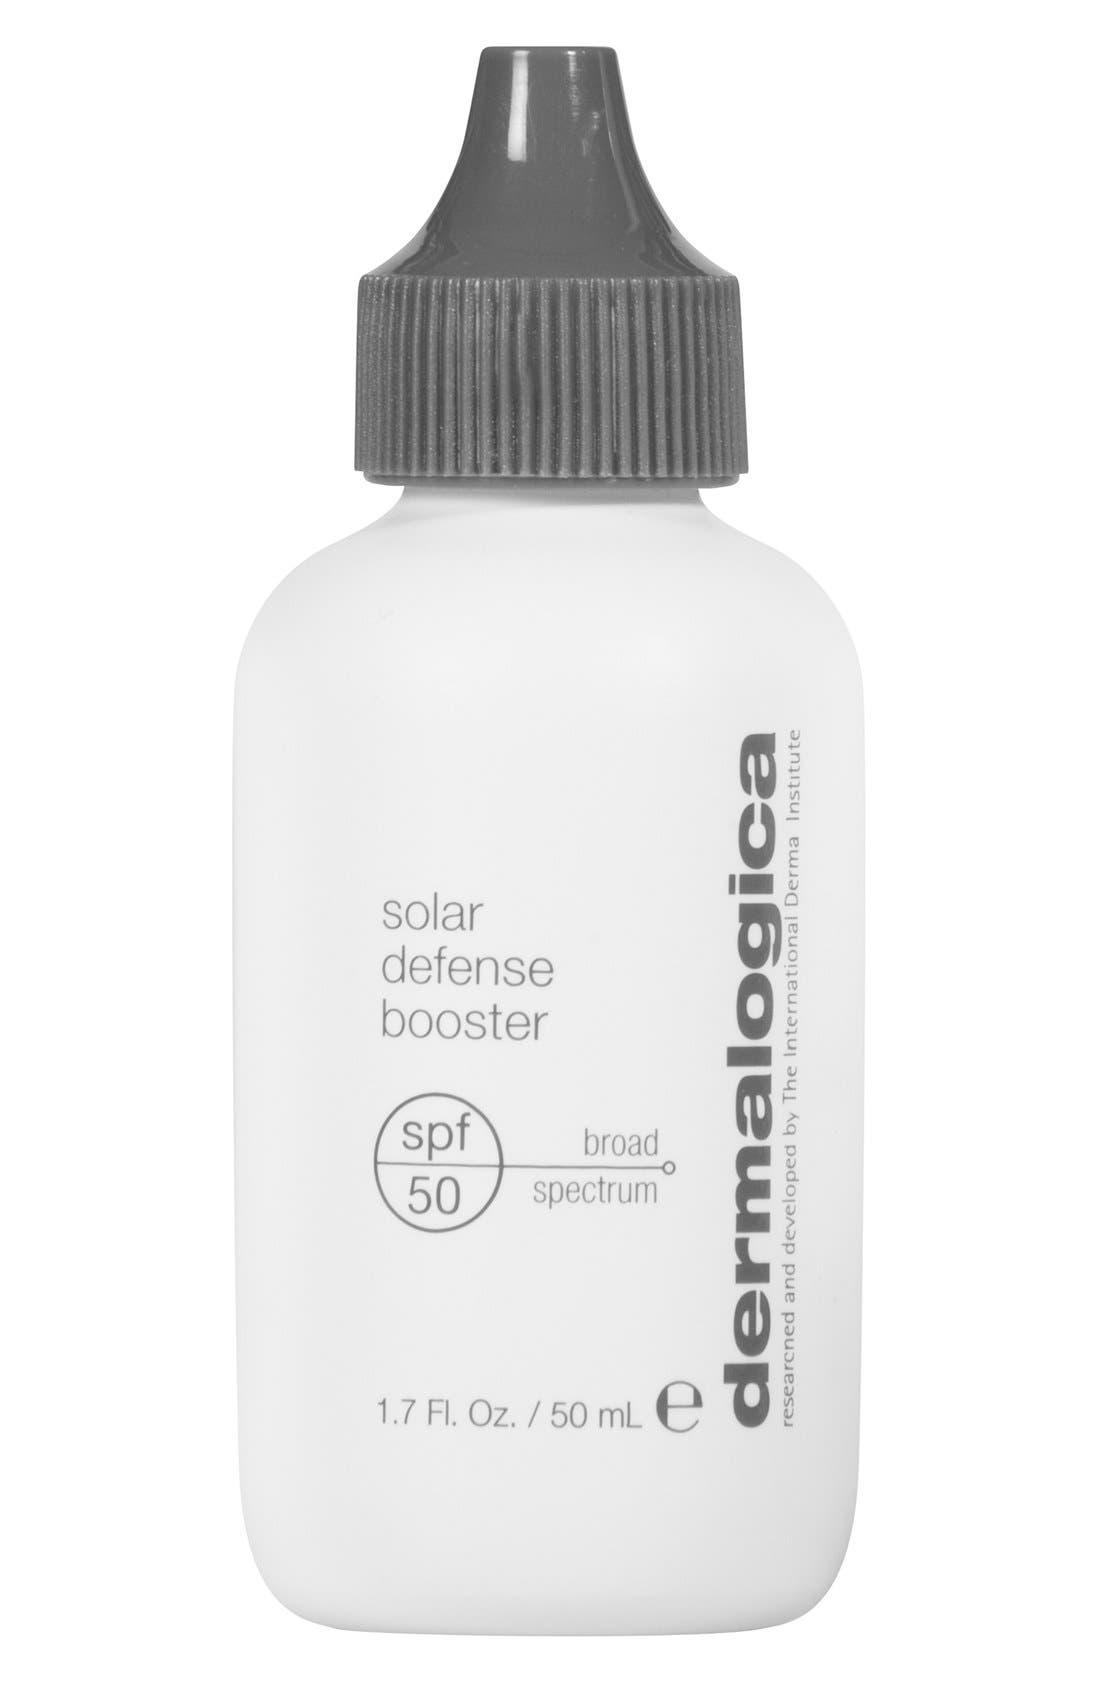 dermalogica® Solar Defense Booster SPF 50